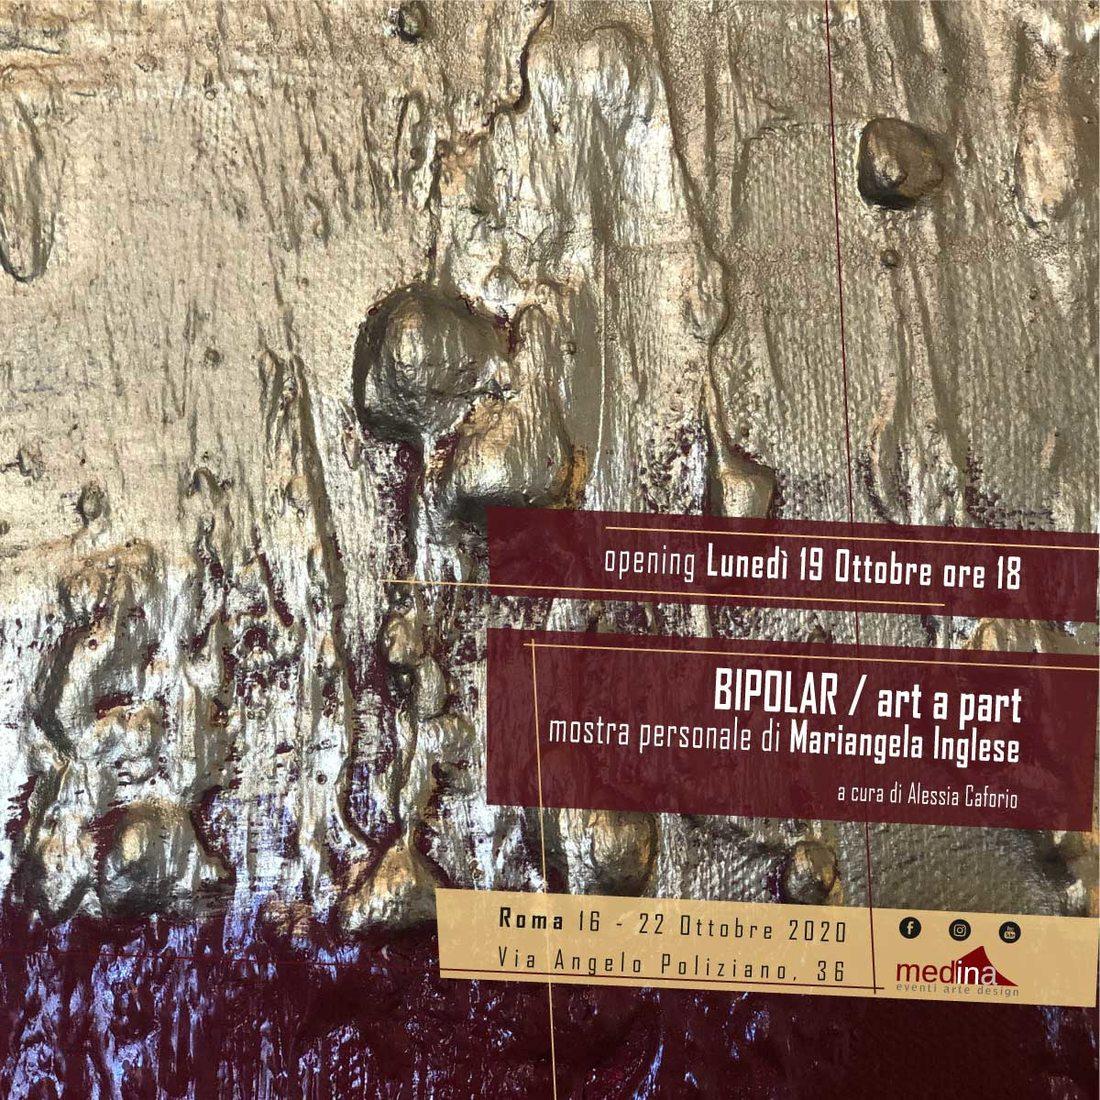 Bipolar | art a part - Mariangela Inglese